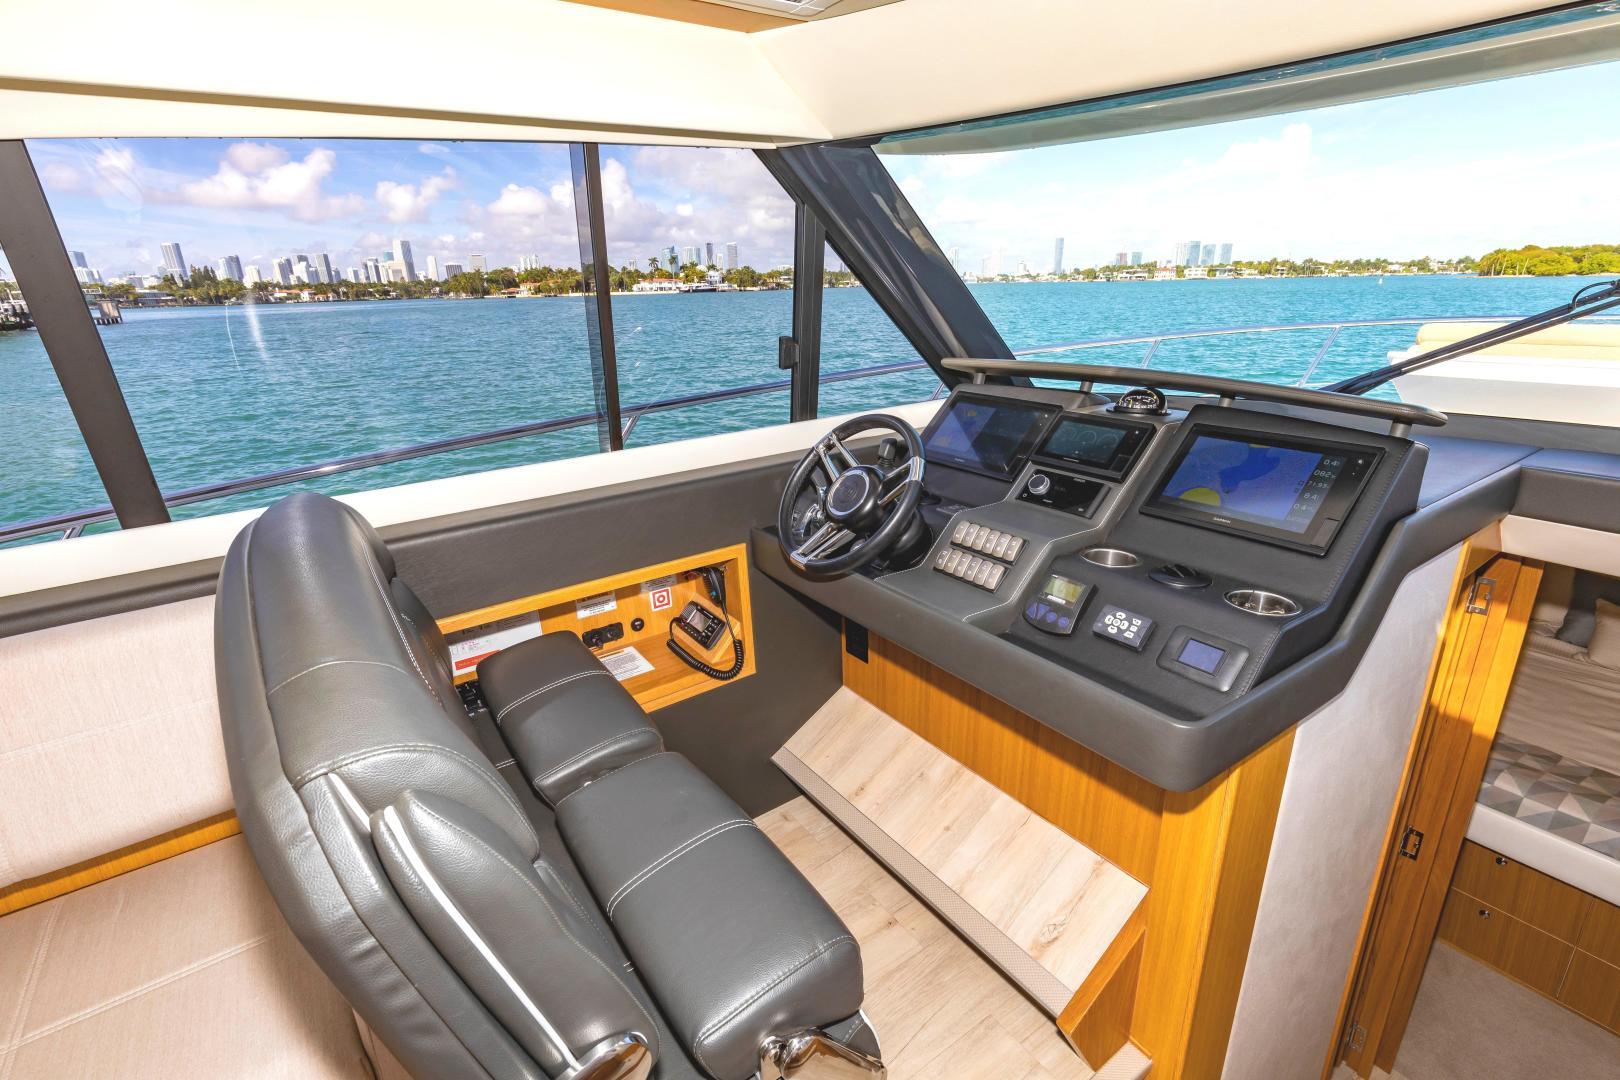 Riviera-395 SUV 2019-Ipanema Miami Beach-Florida-United States-1614906   Thumbnail